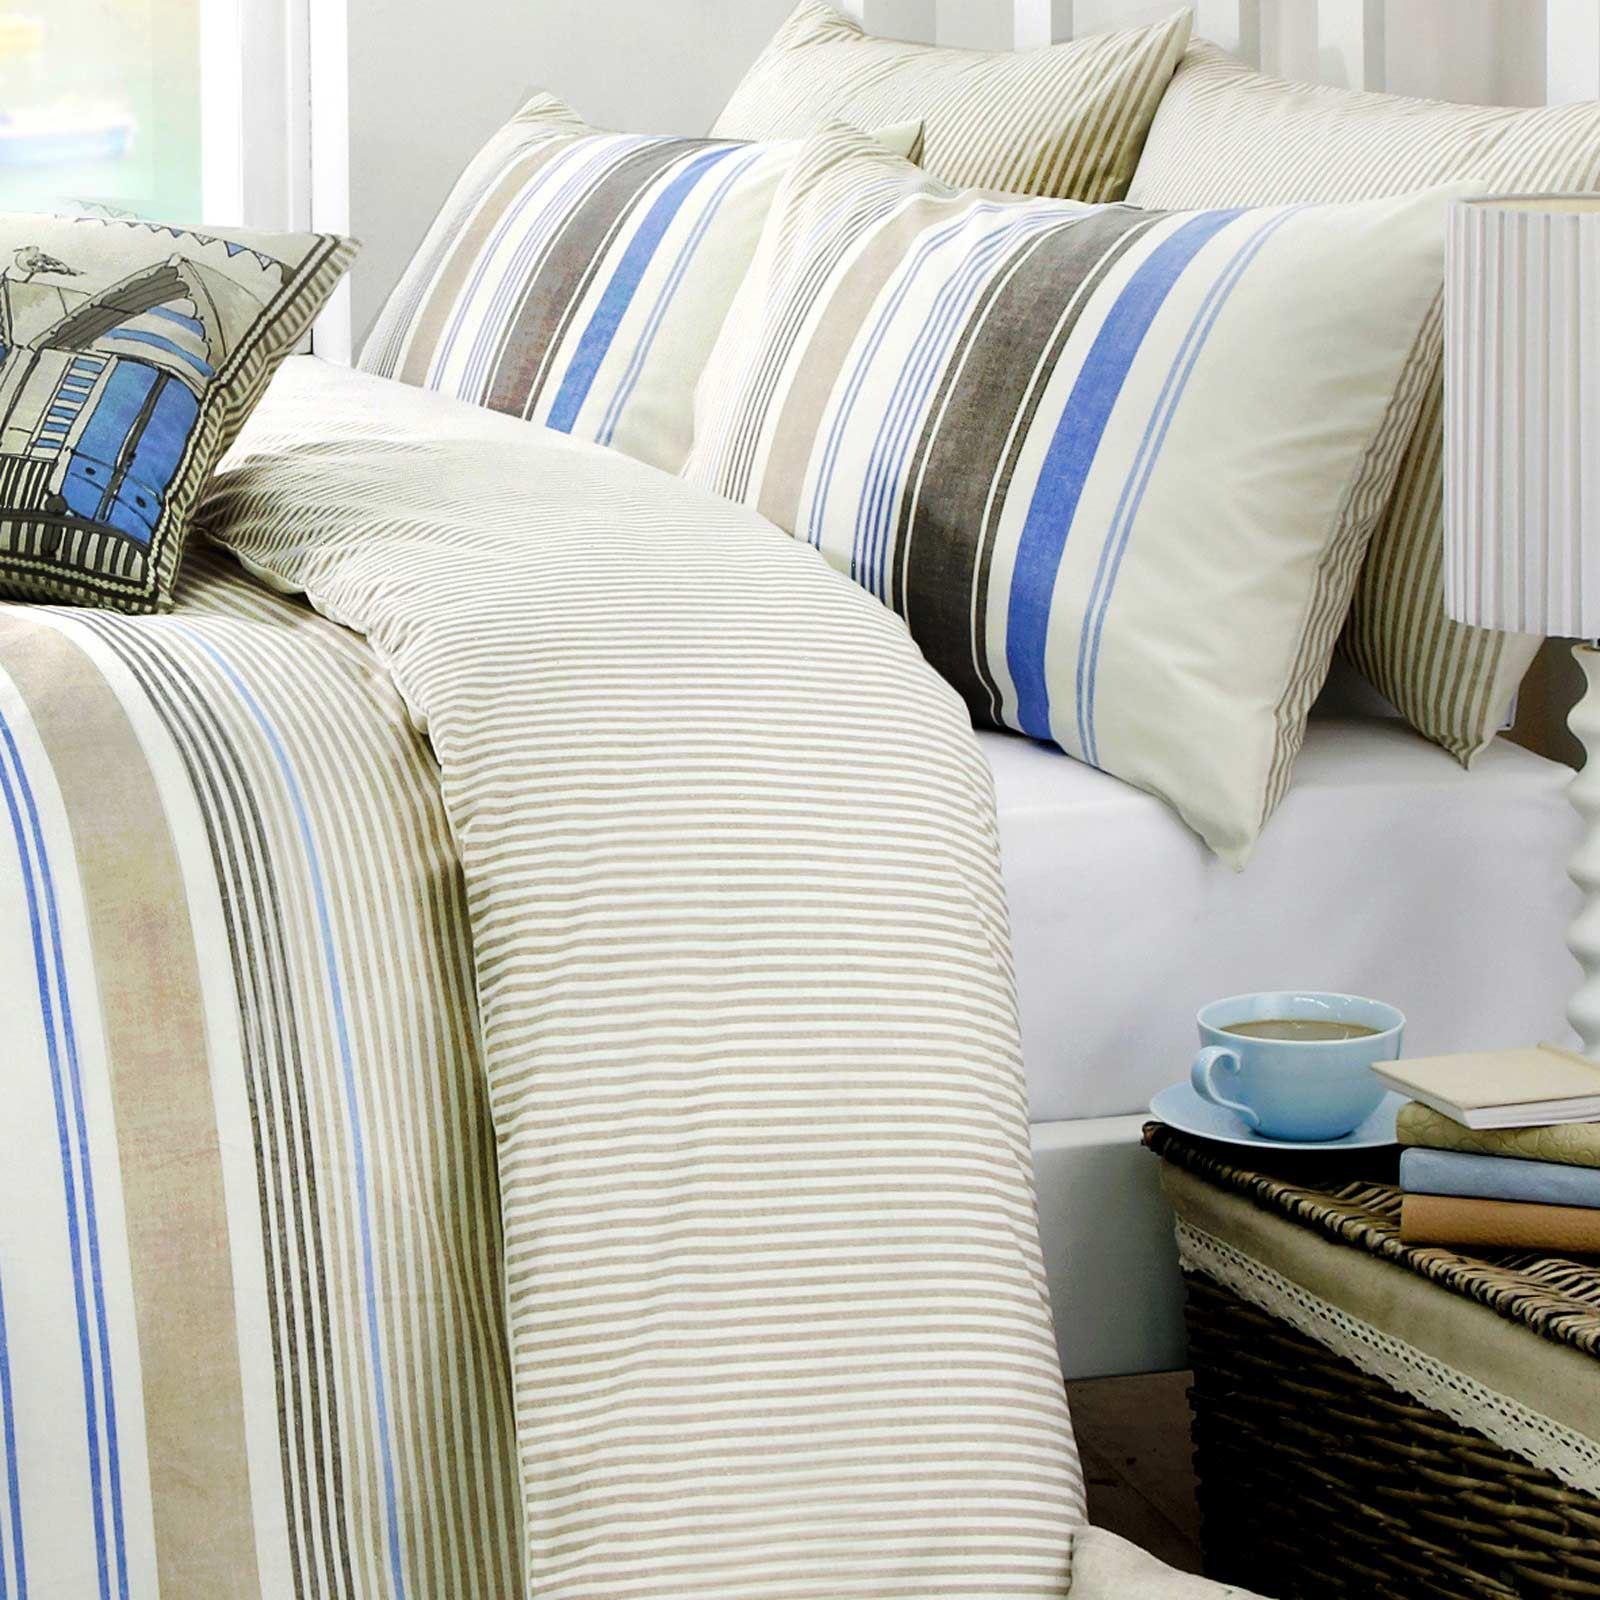 Teal Duvet Cover Navy Blue Quilt Covers Bedding Set Single